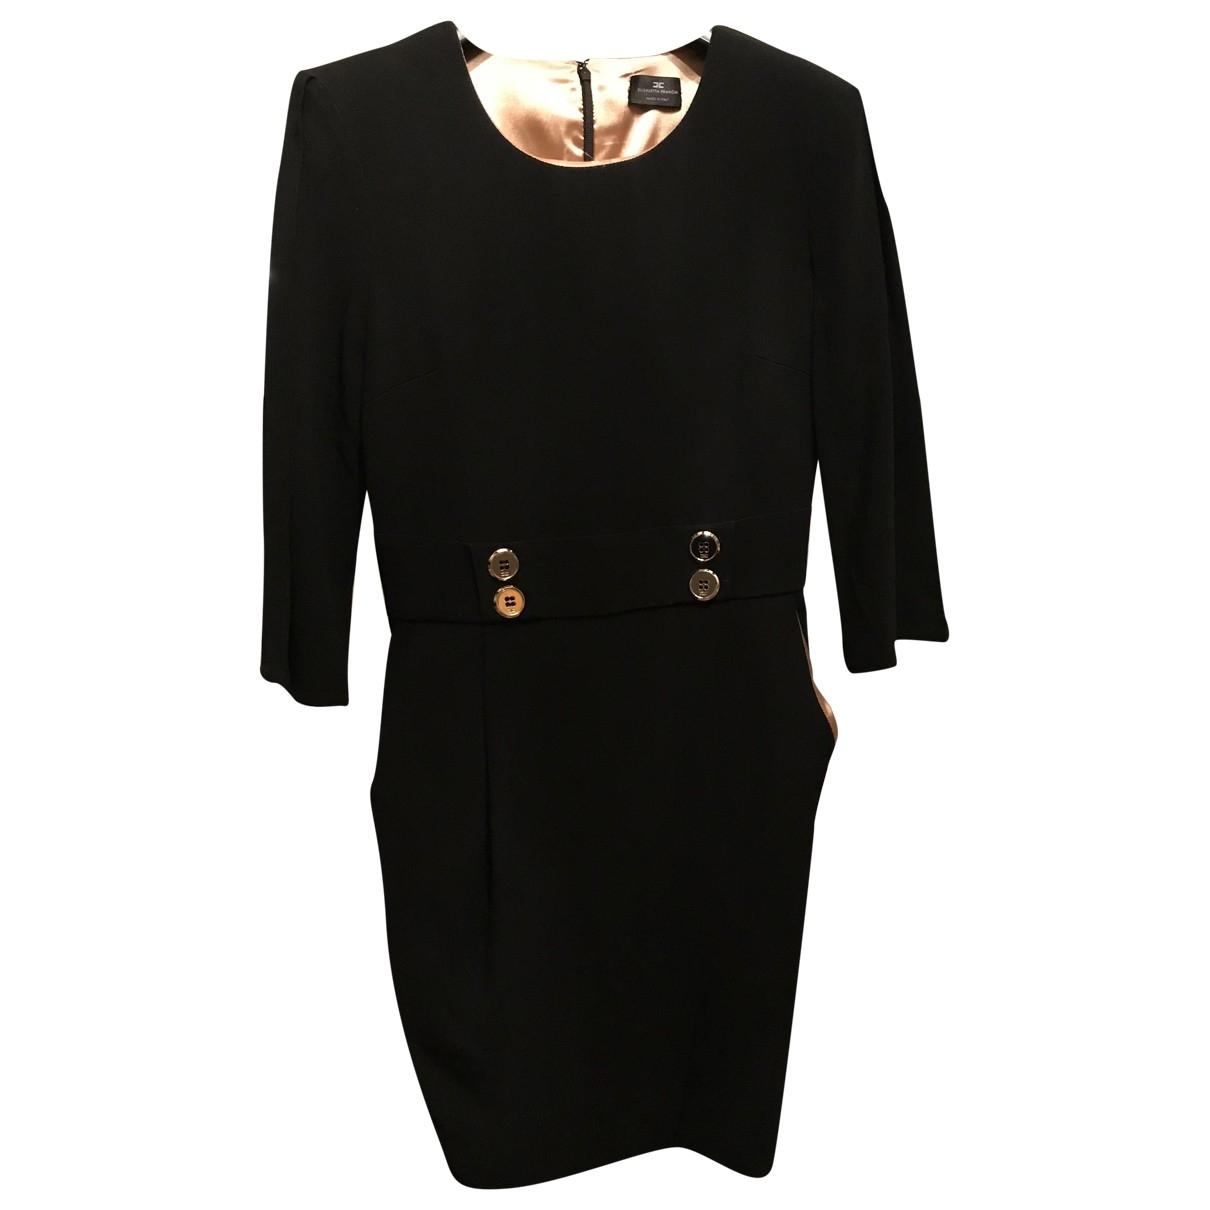 Elisabetta Franchi \N Black Cotton dress for Women 42 IT